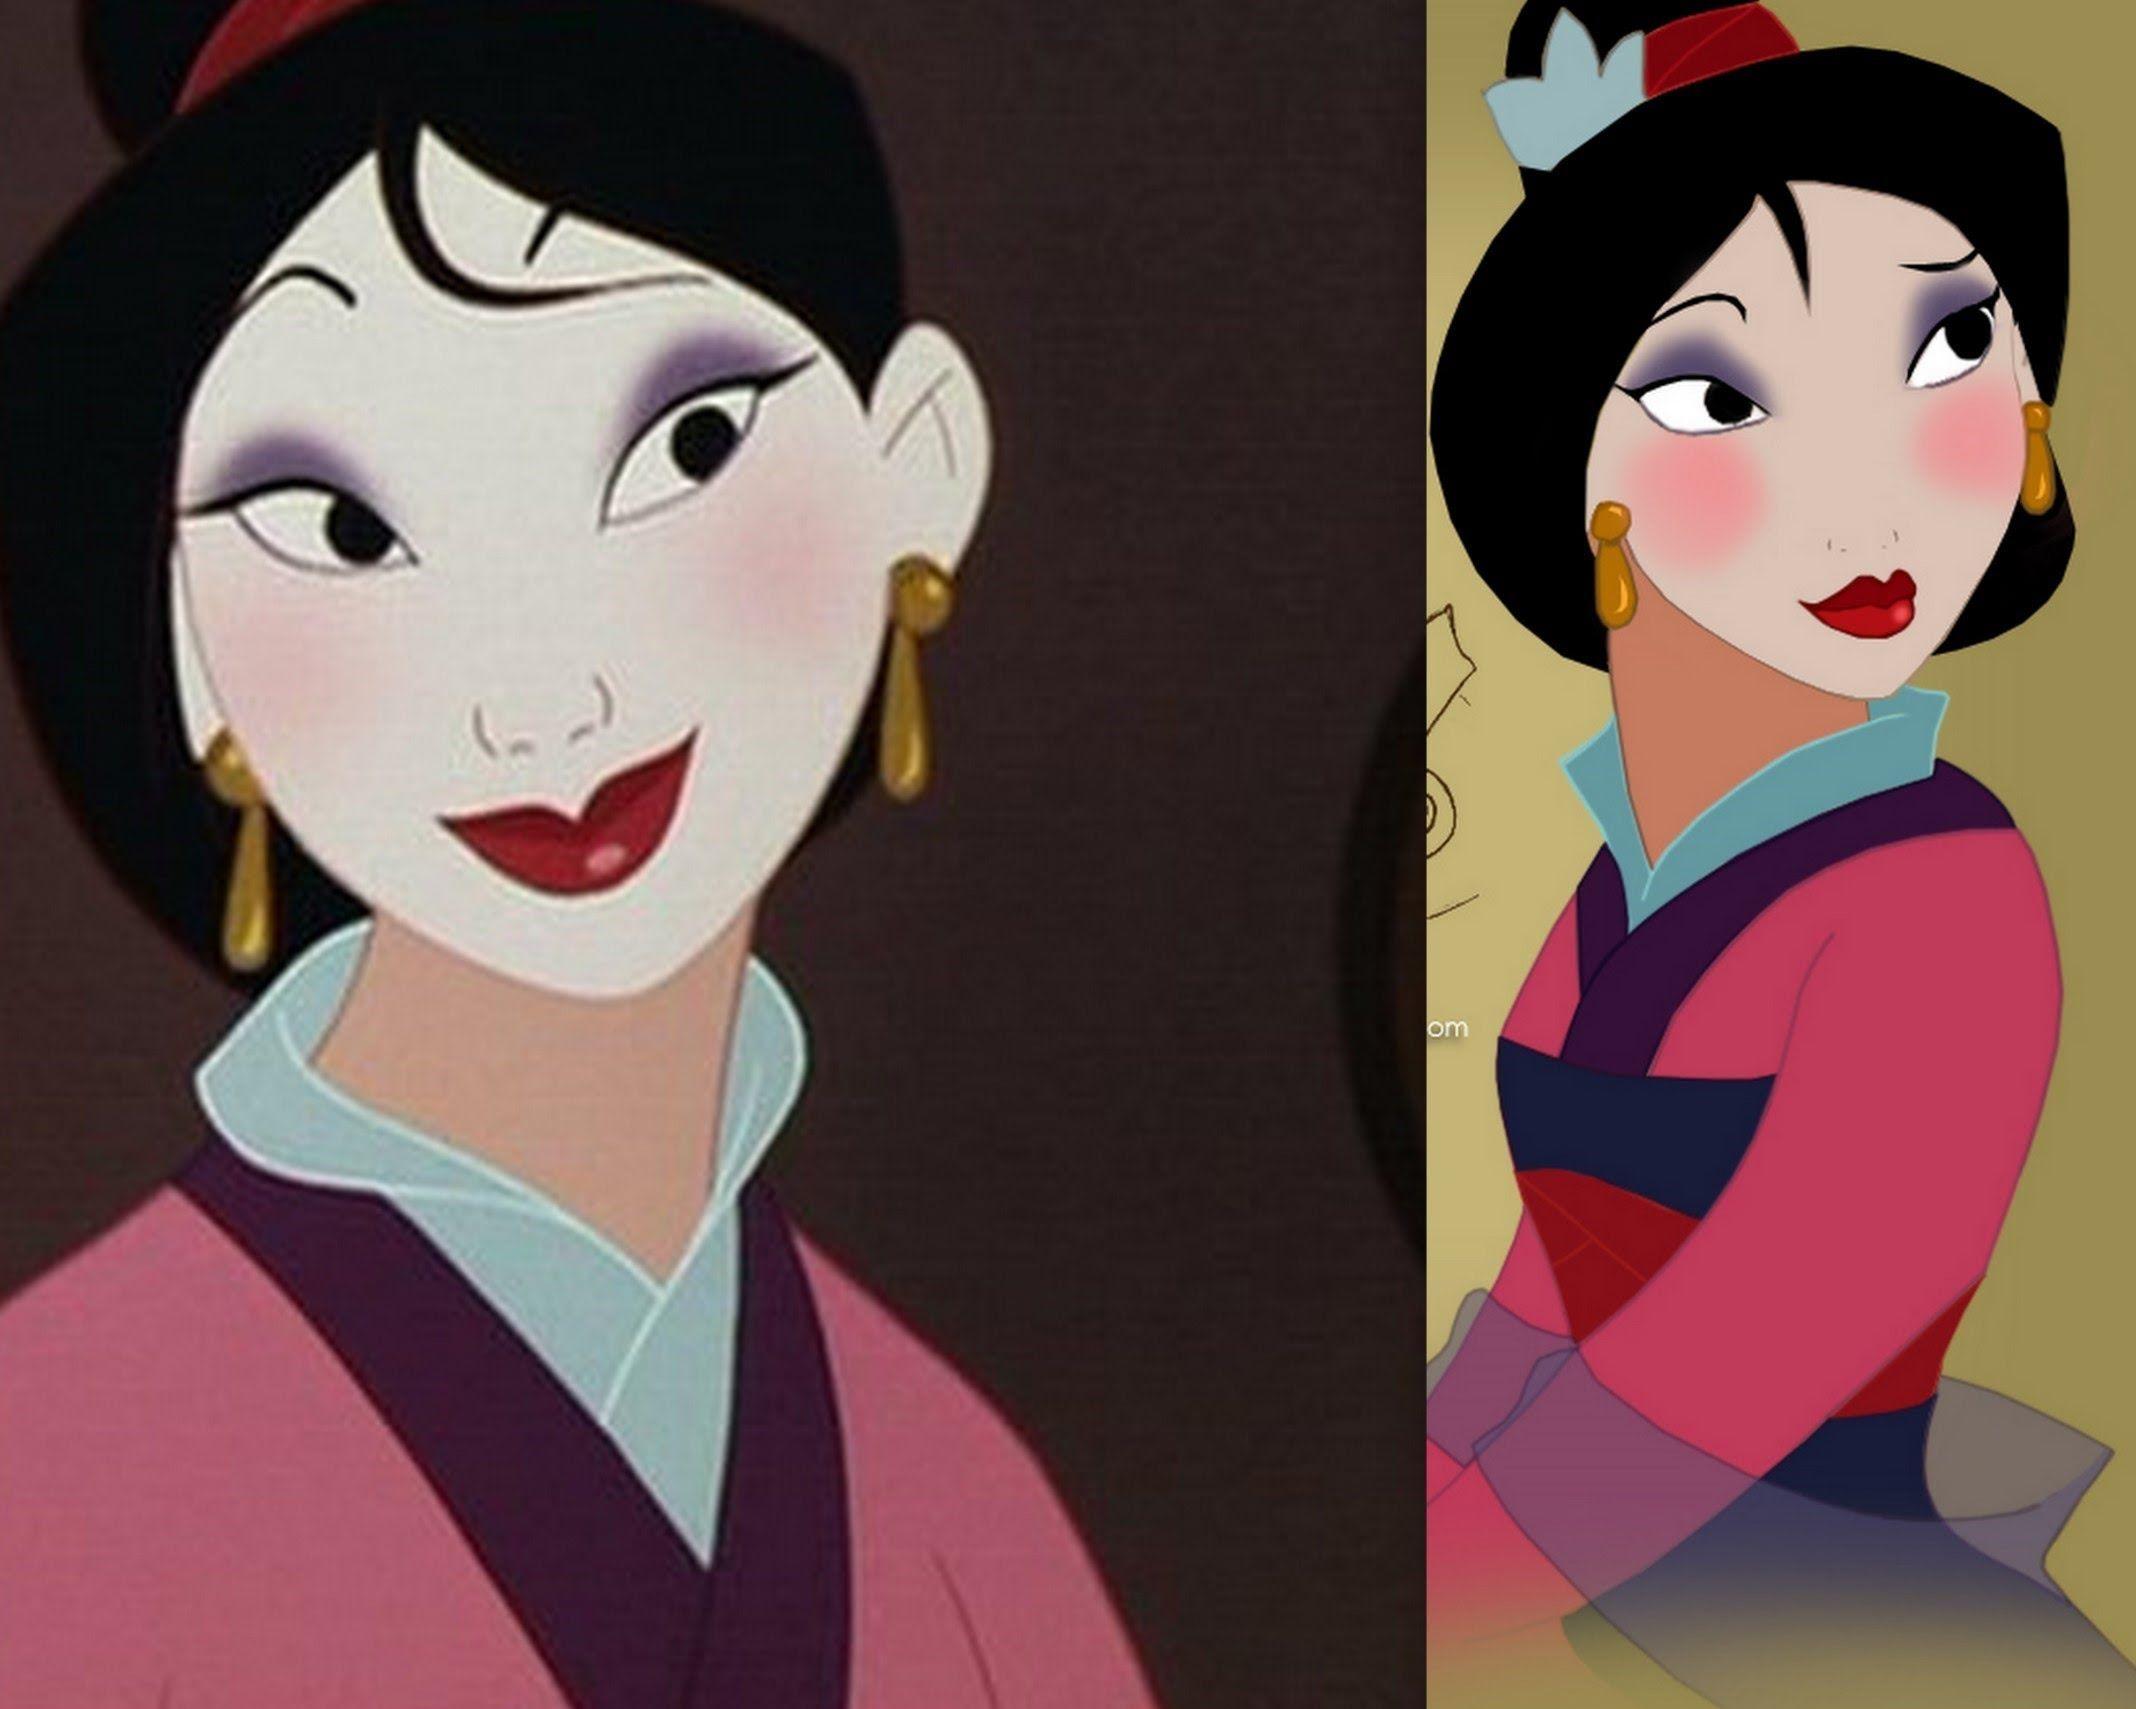 Disney Princess Mulan maxresdefault.jpg Disney